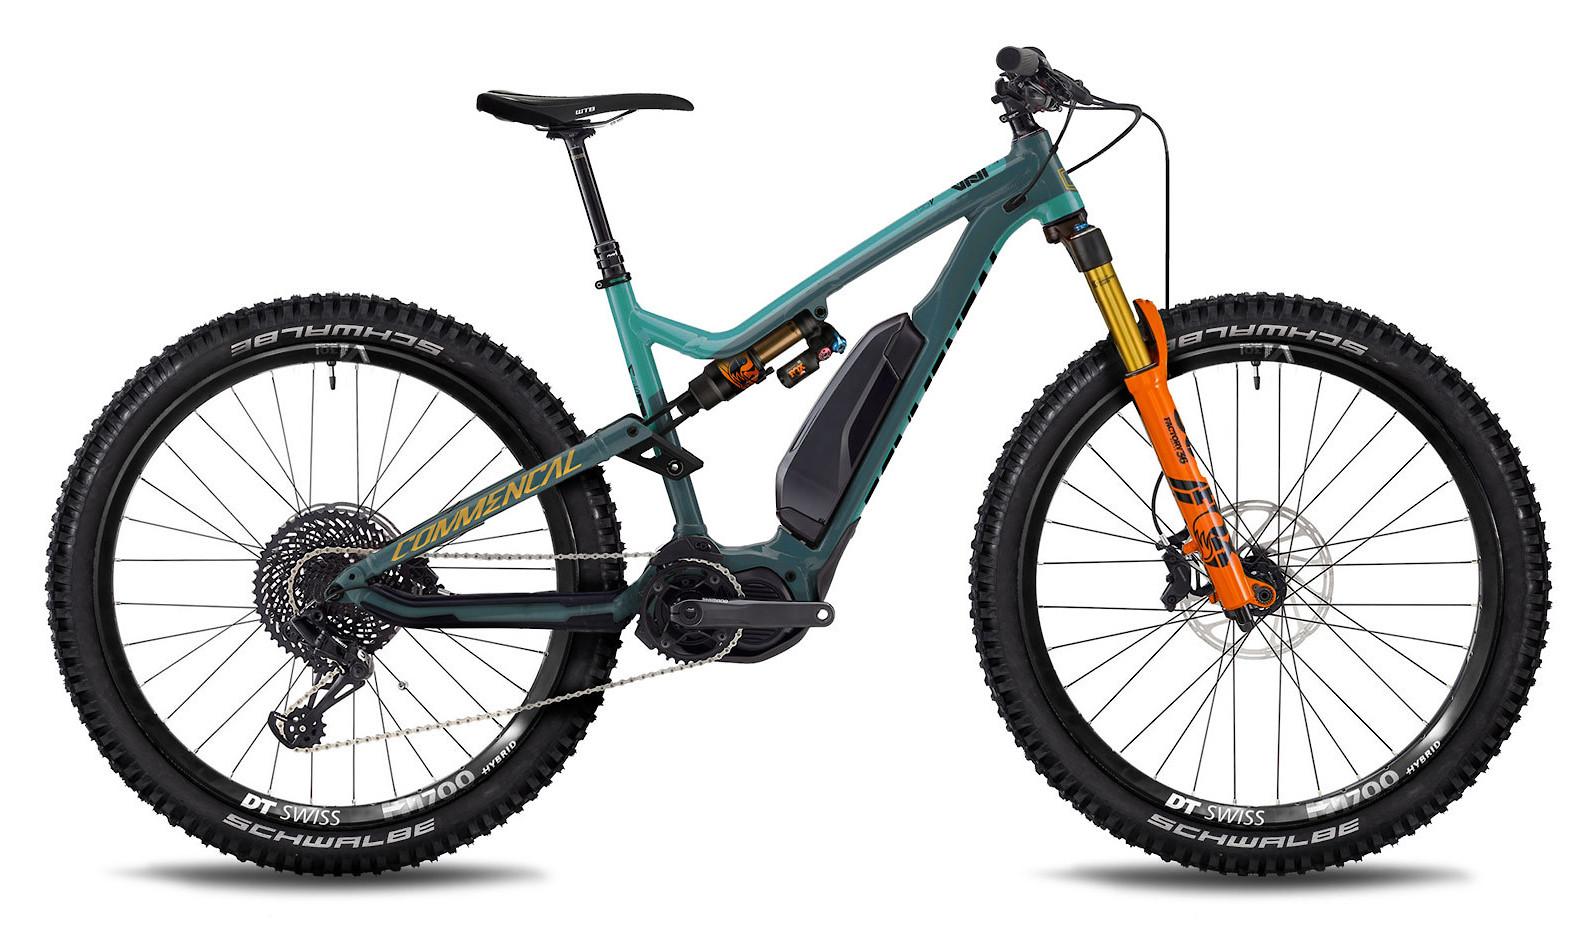 2019 Commencal Meta Power 29 Signature E-Bike